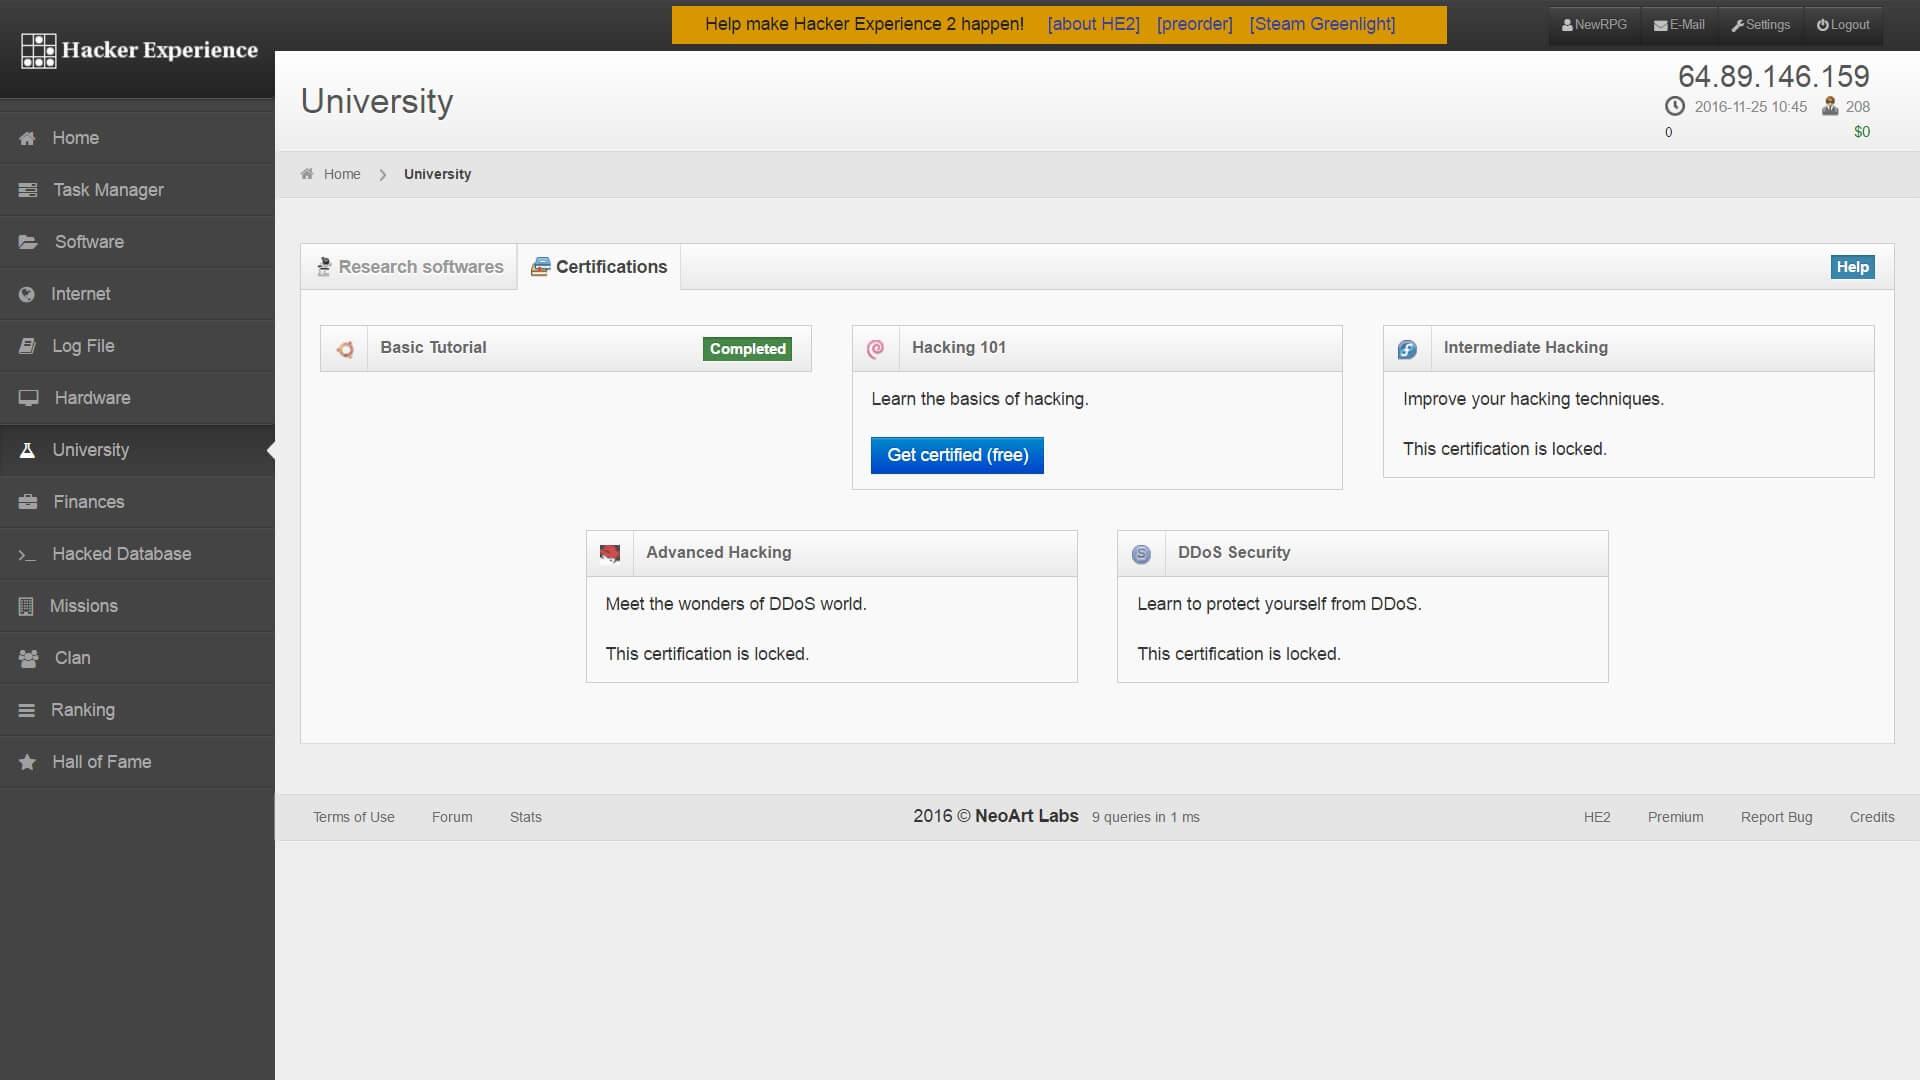 Hacker Experience - Online Simulation RPG